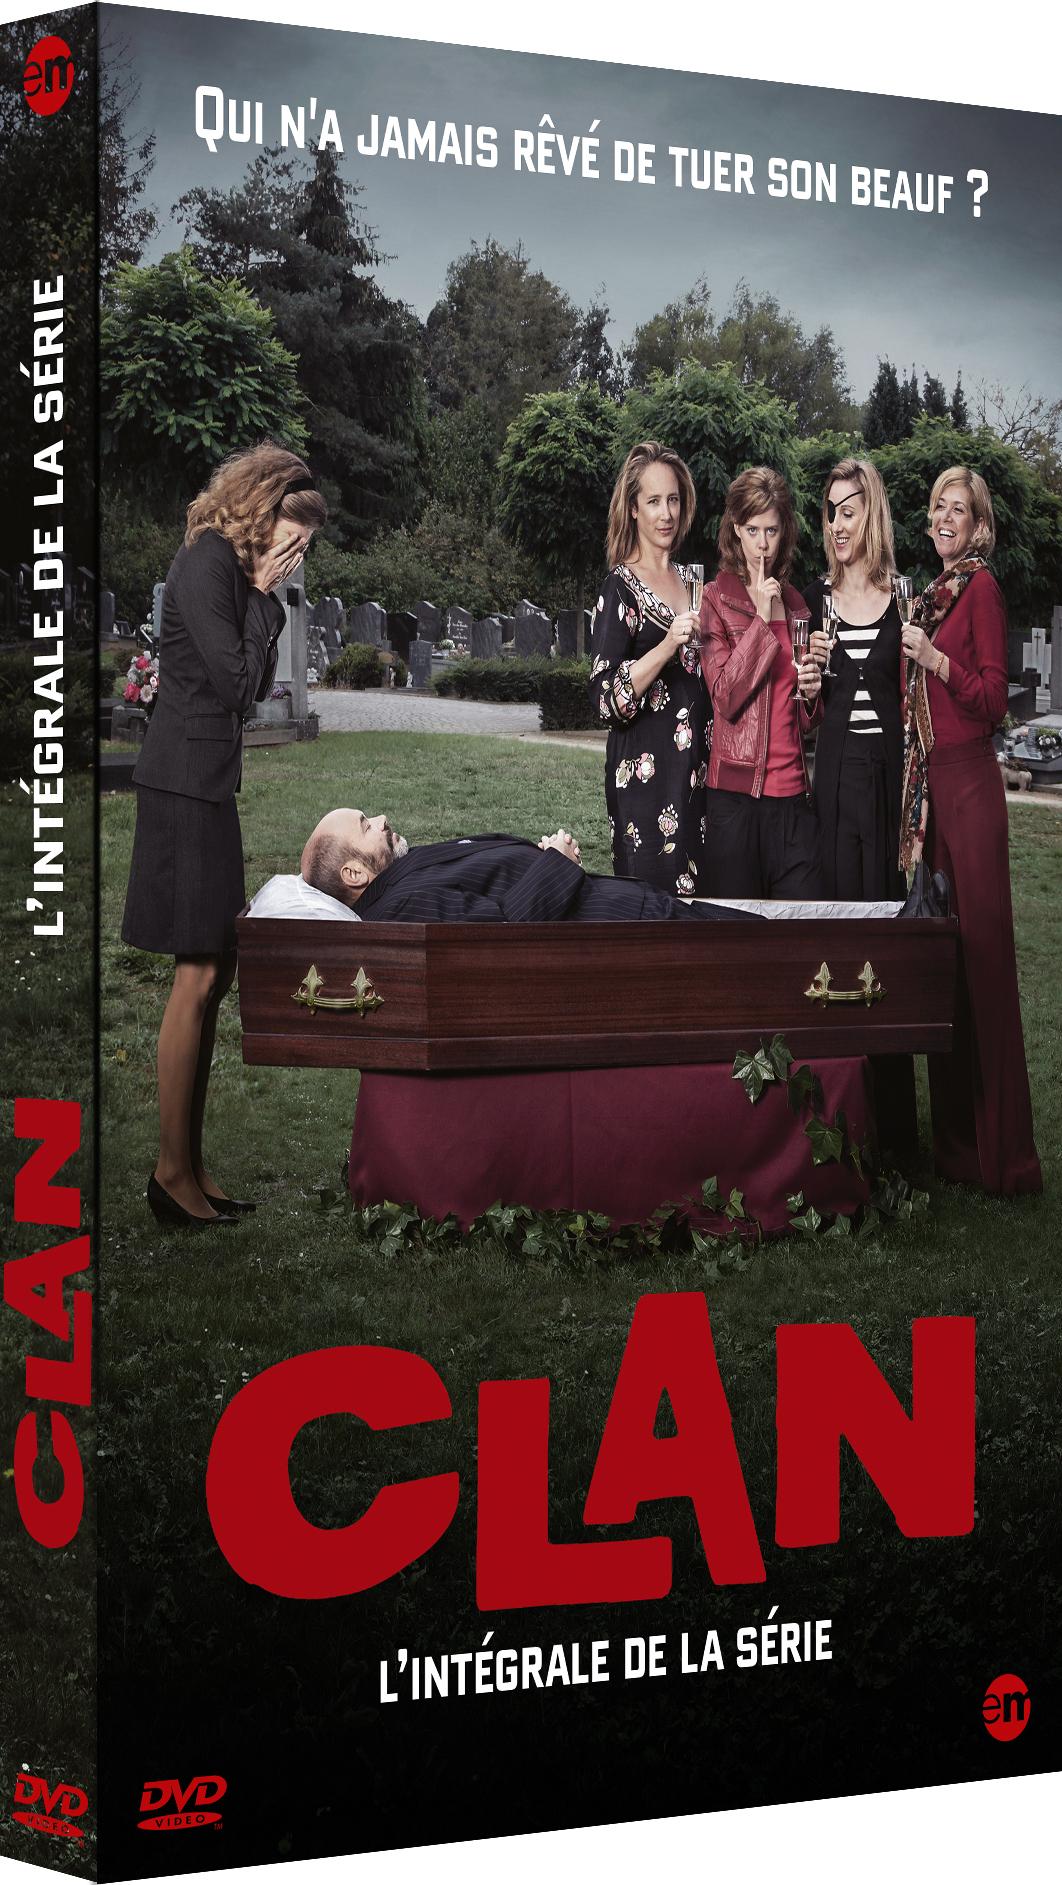 CLAN - INTEGRALE DE LA SERIE - 3 DVD